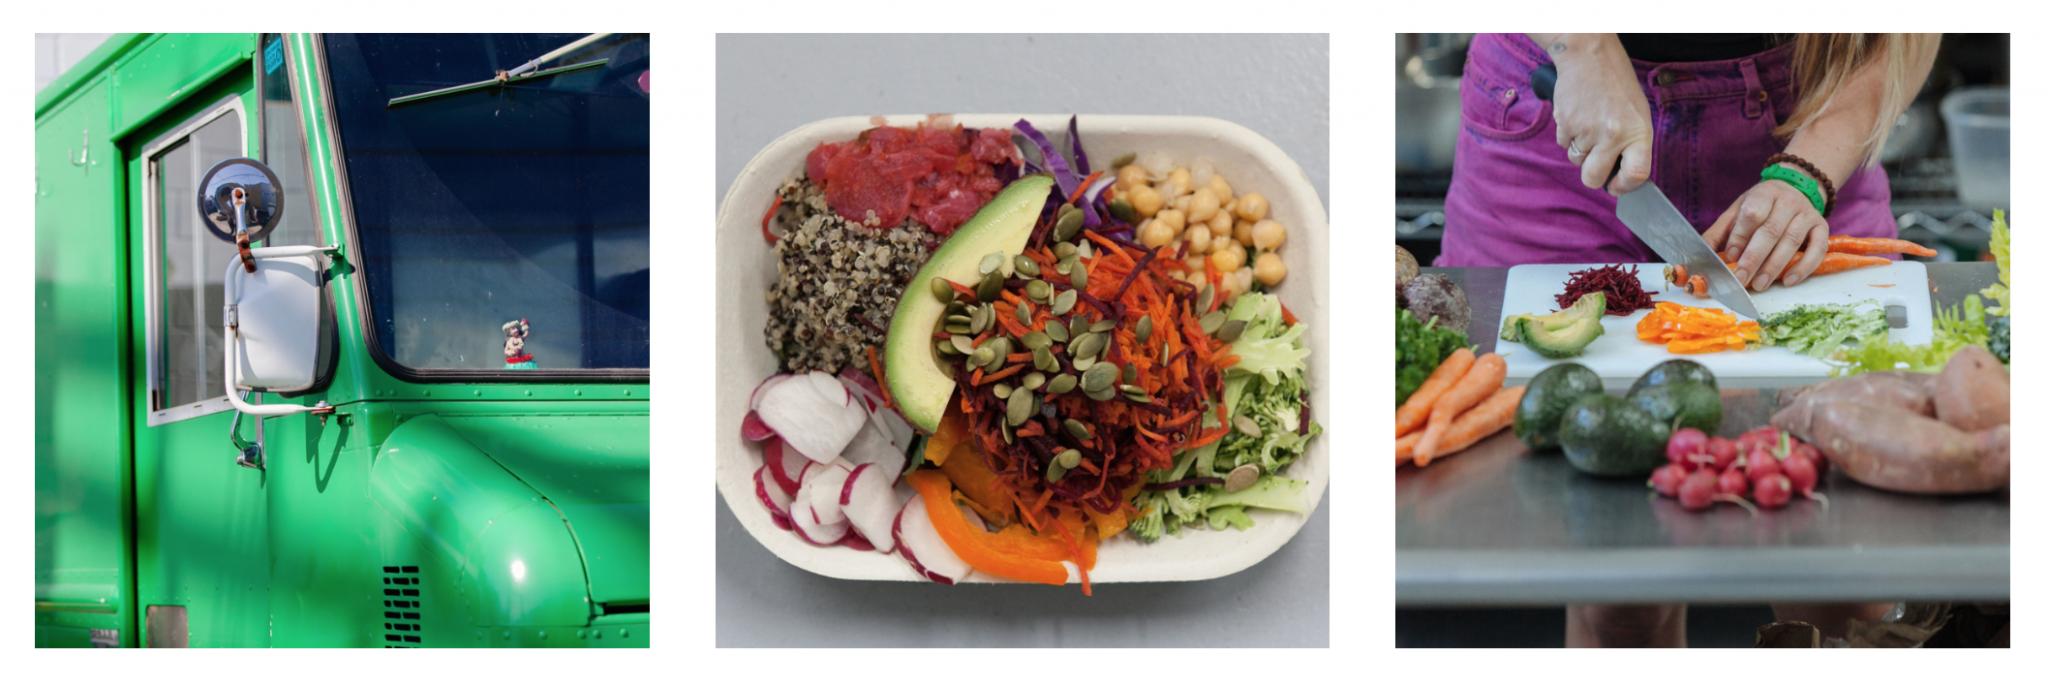 Marketmonday Vendor Culver City Salads My Van City